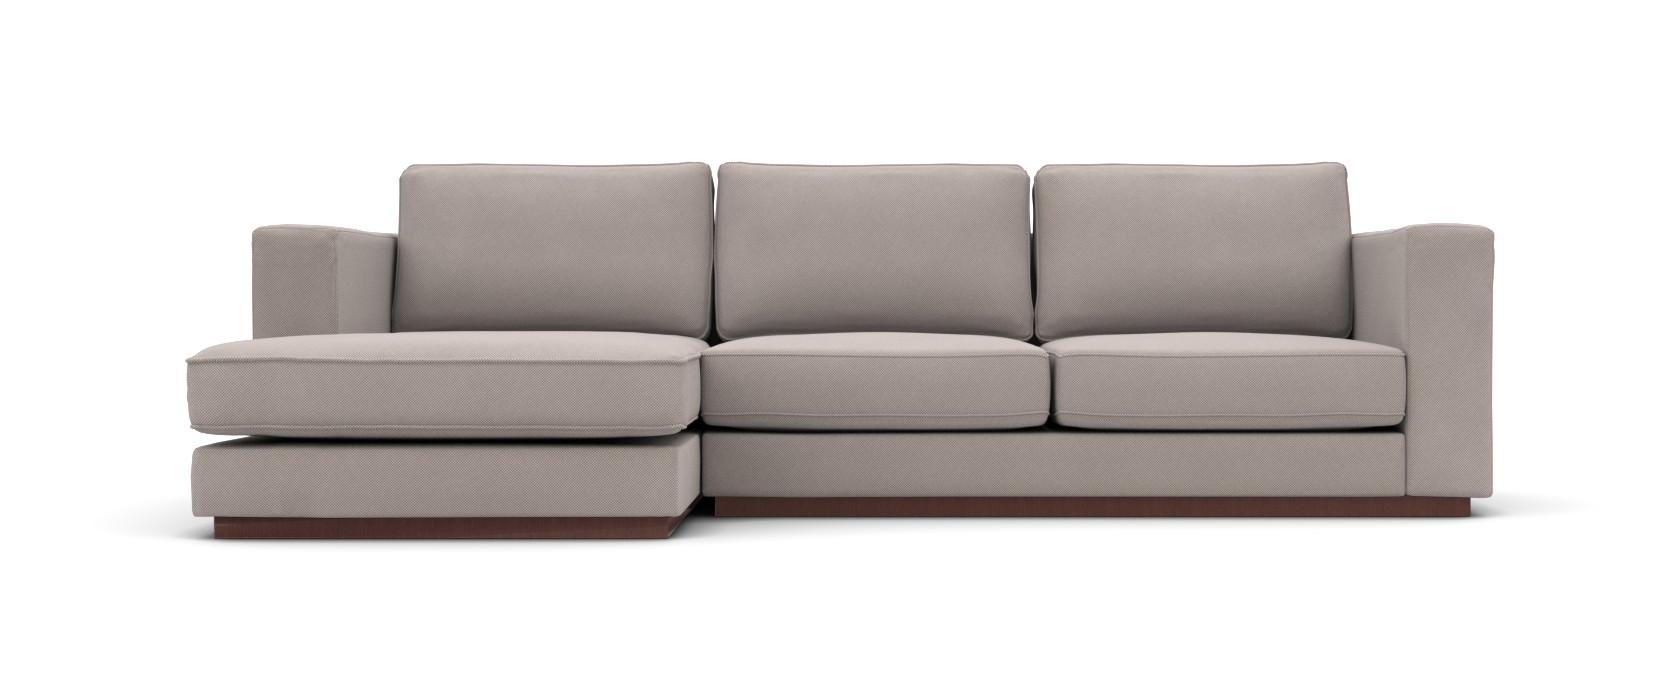 Sofa mit Chaiselongue Milano